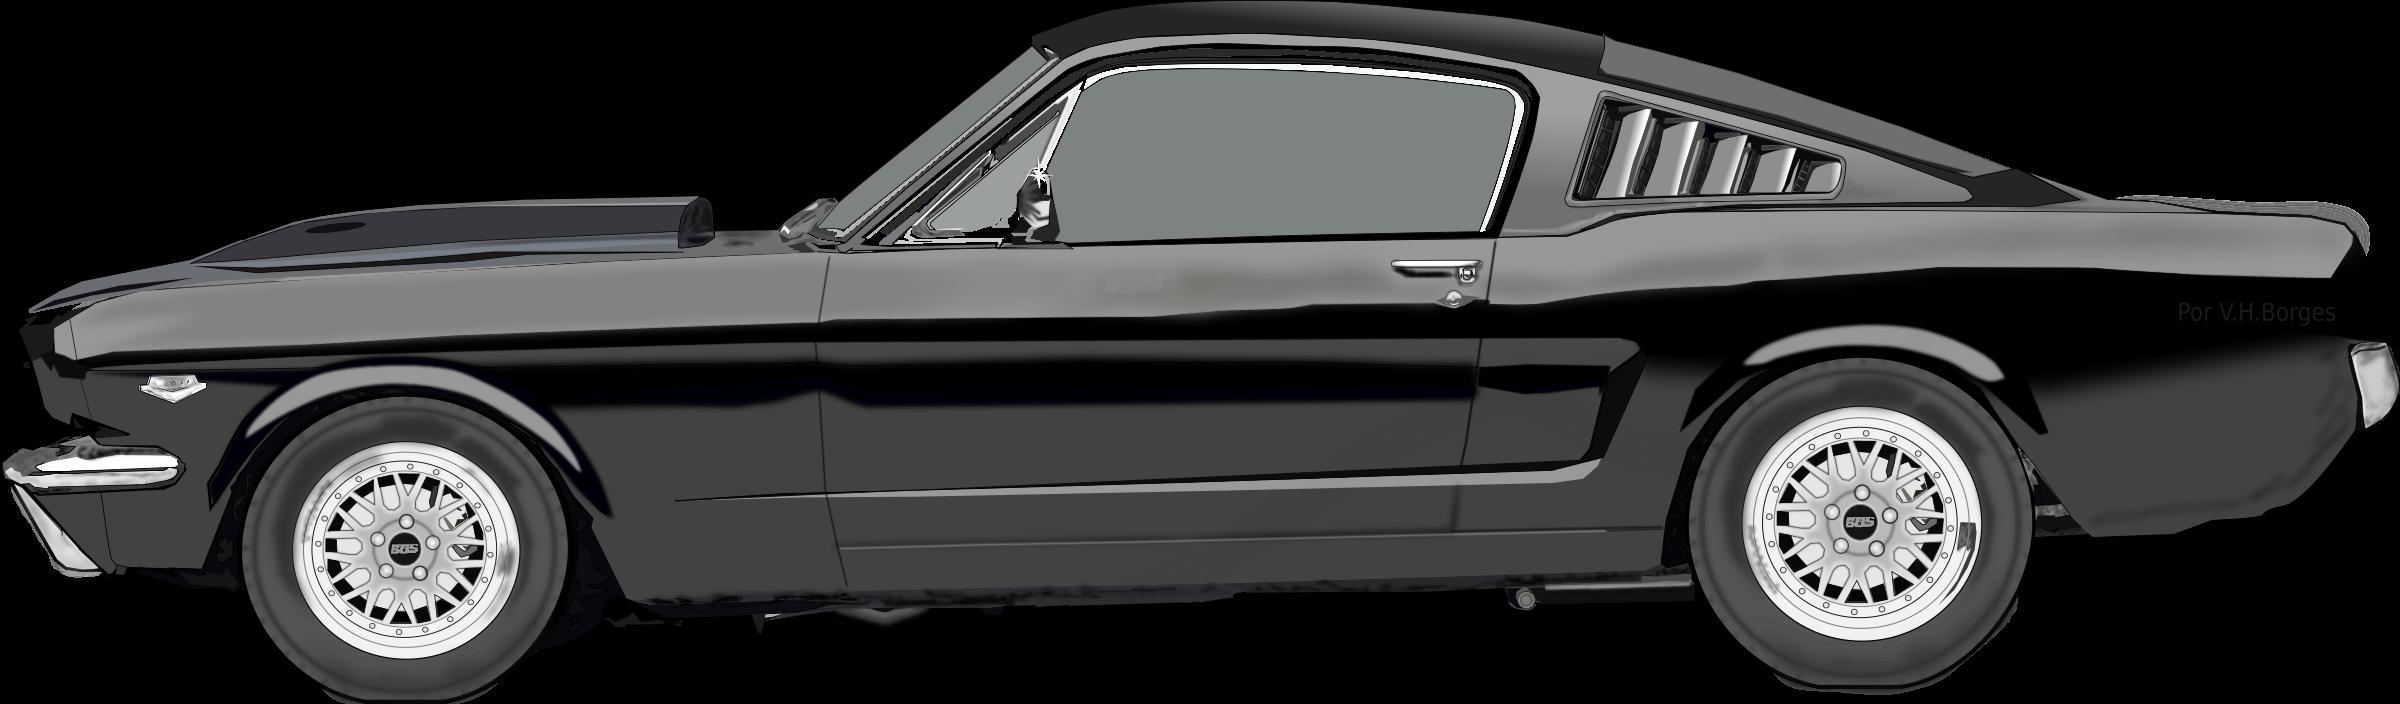 Similiar Ford Mustang Clip Art Keywords.